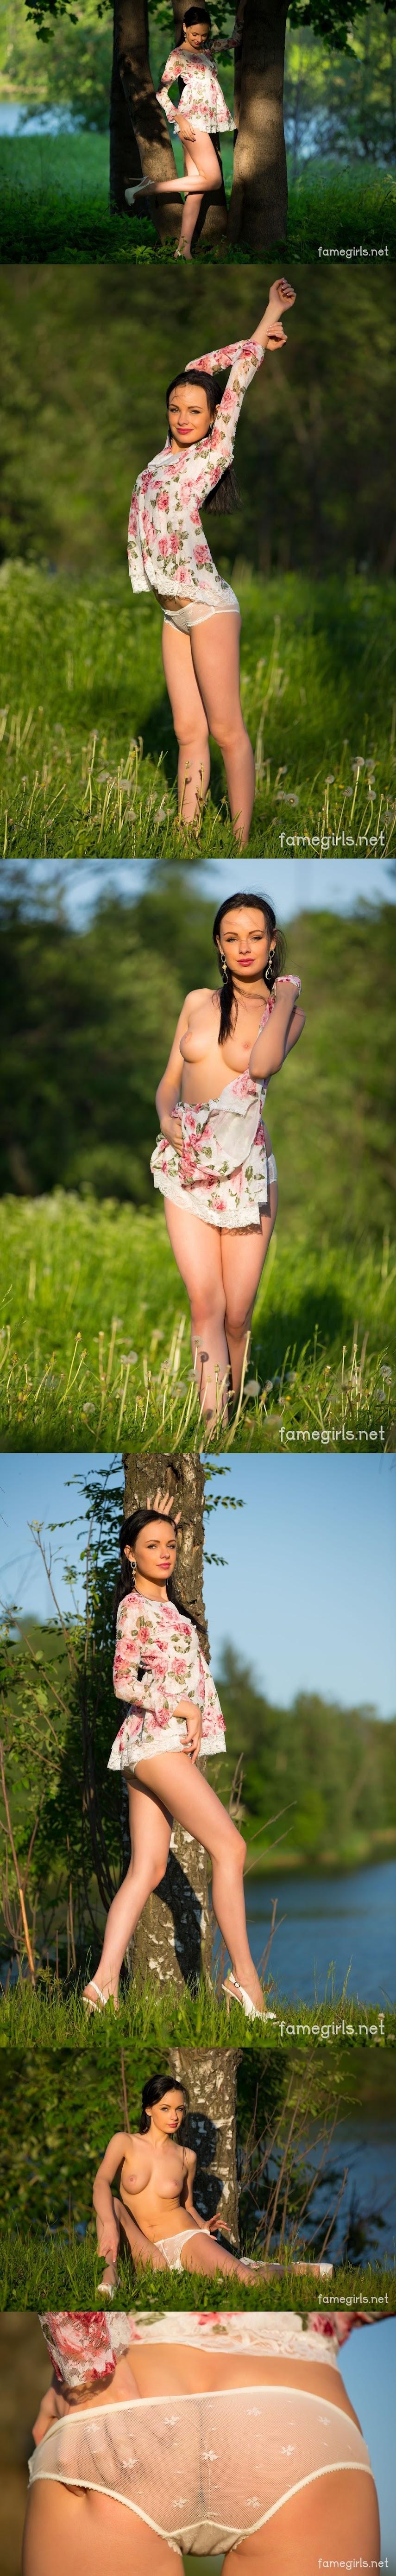 FameGirls Katie- 020 x1313840x5760